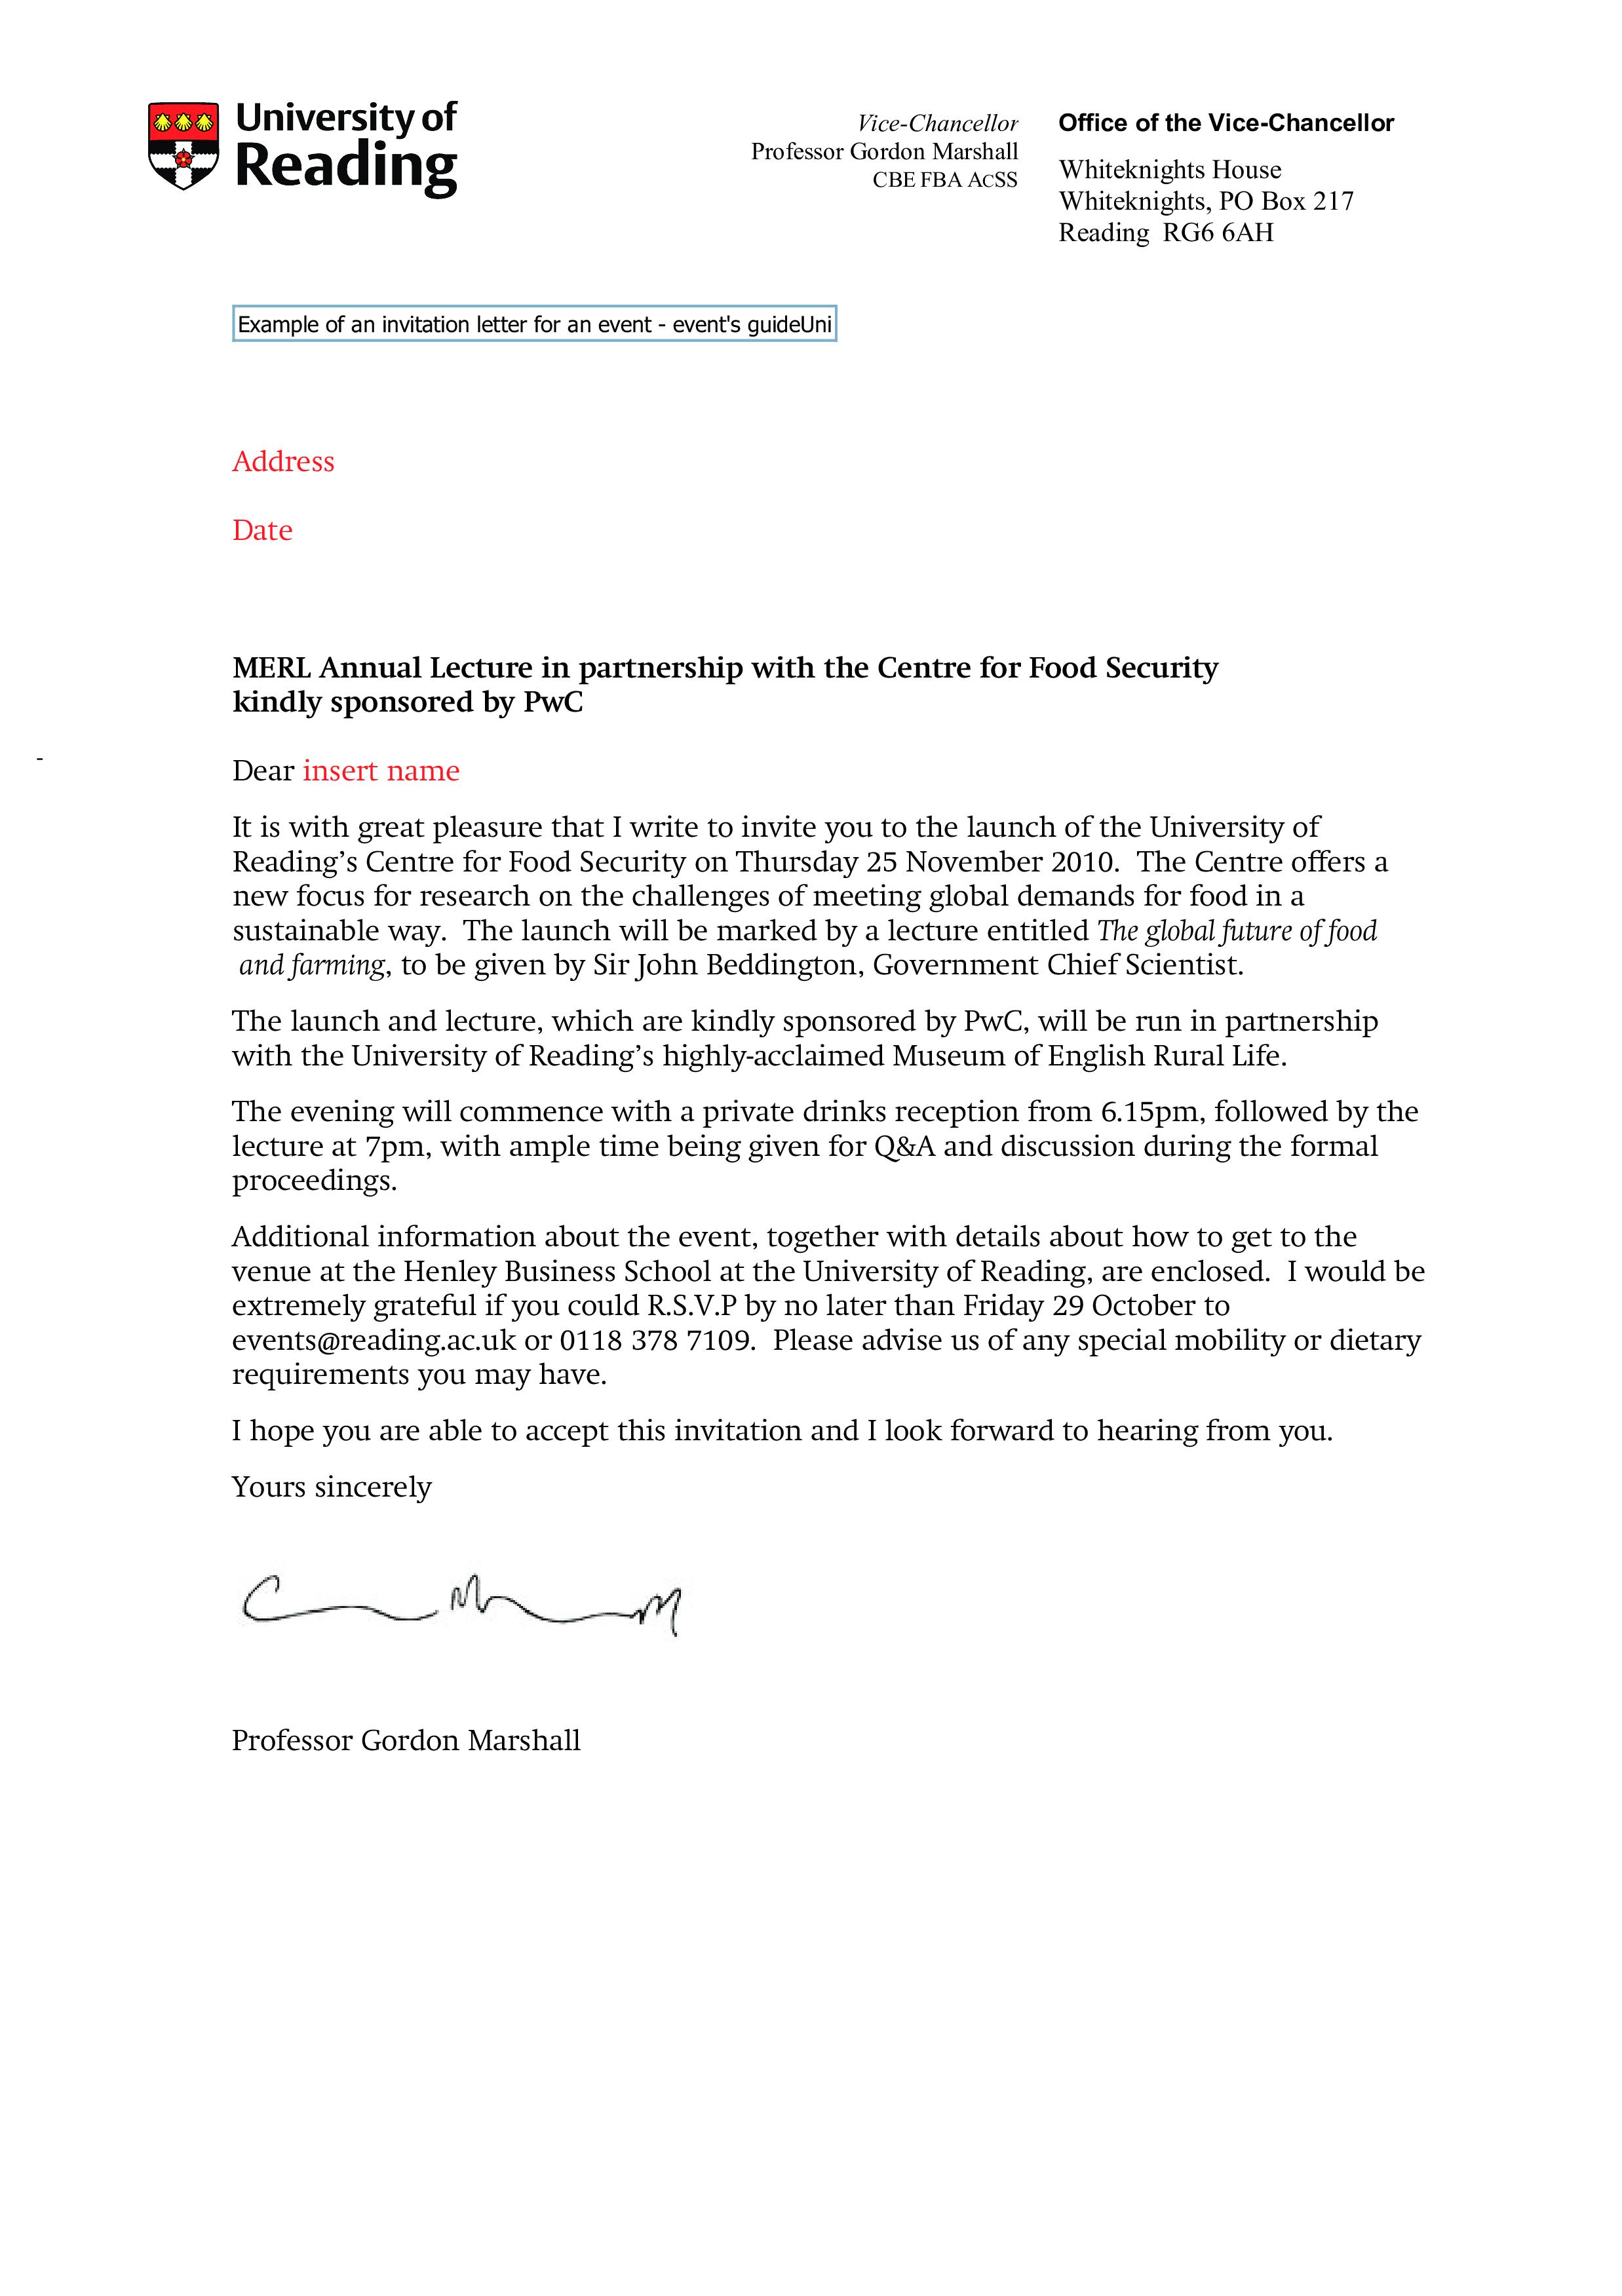 Formal Invitation Letter Sample For An Event